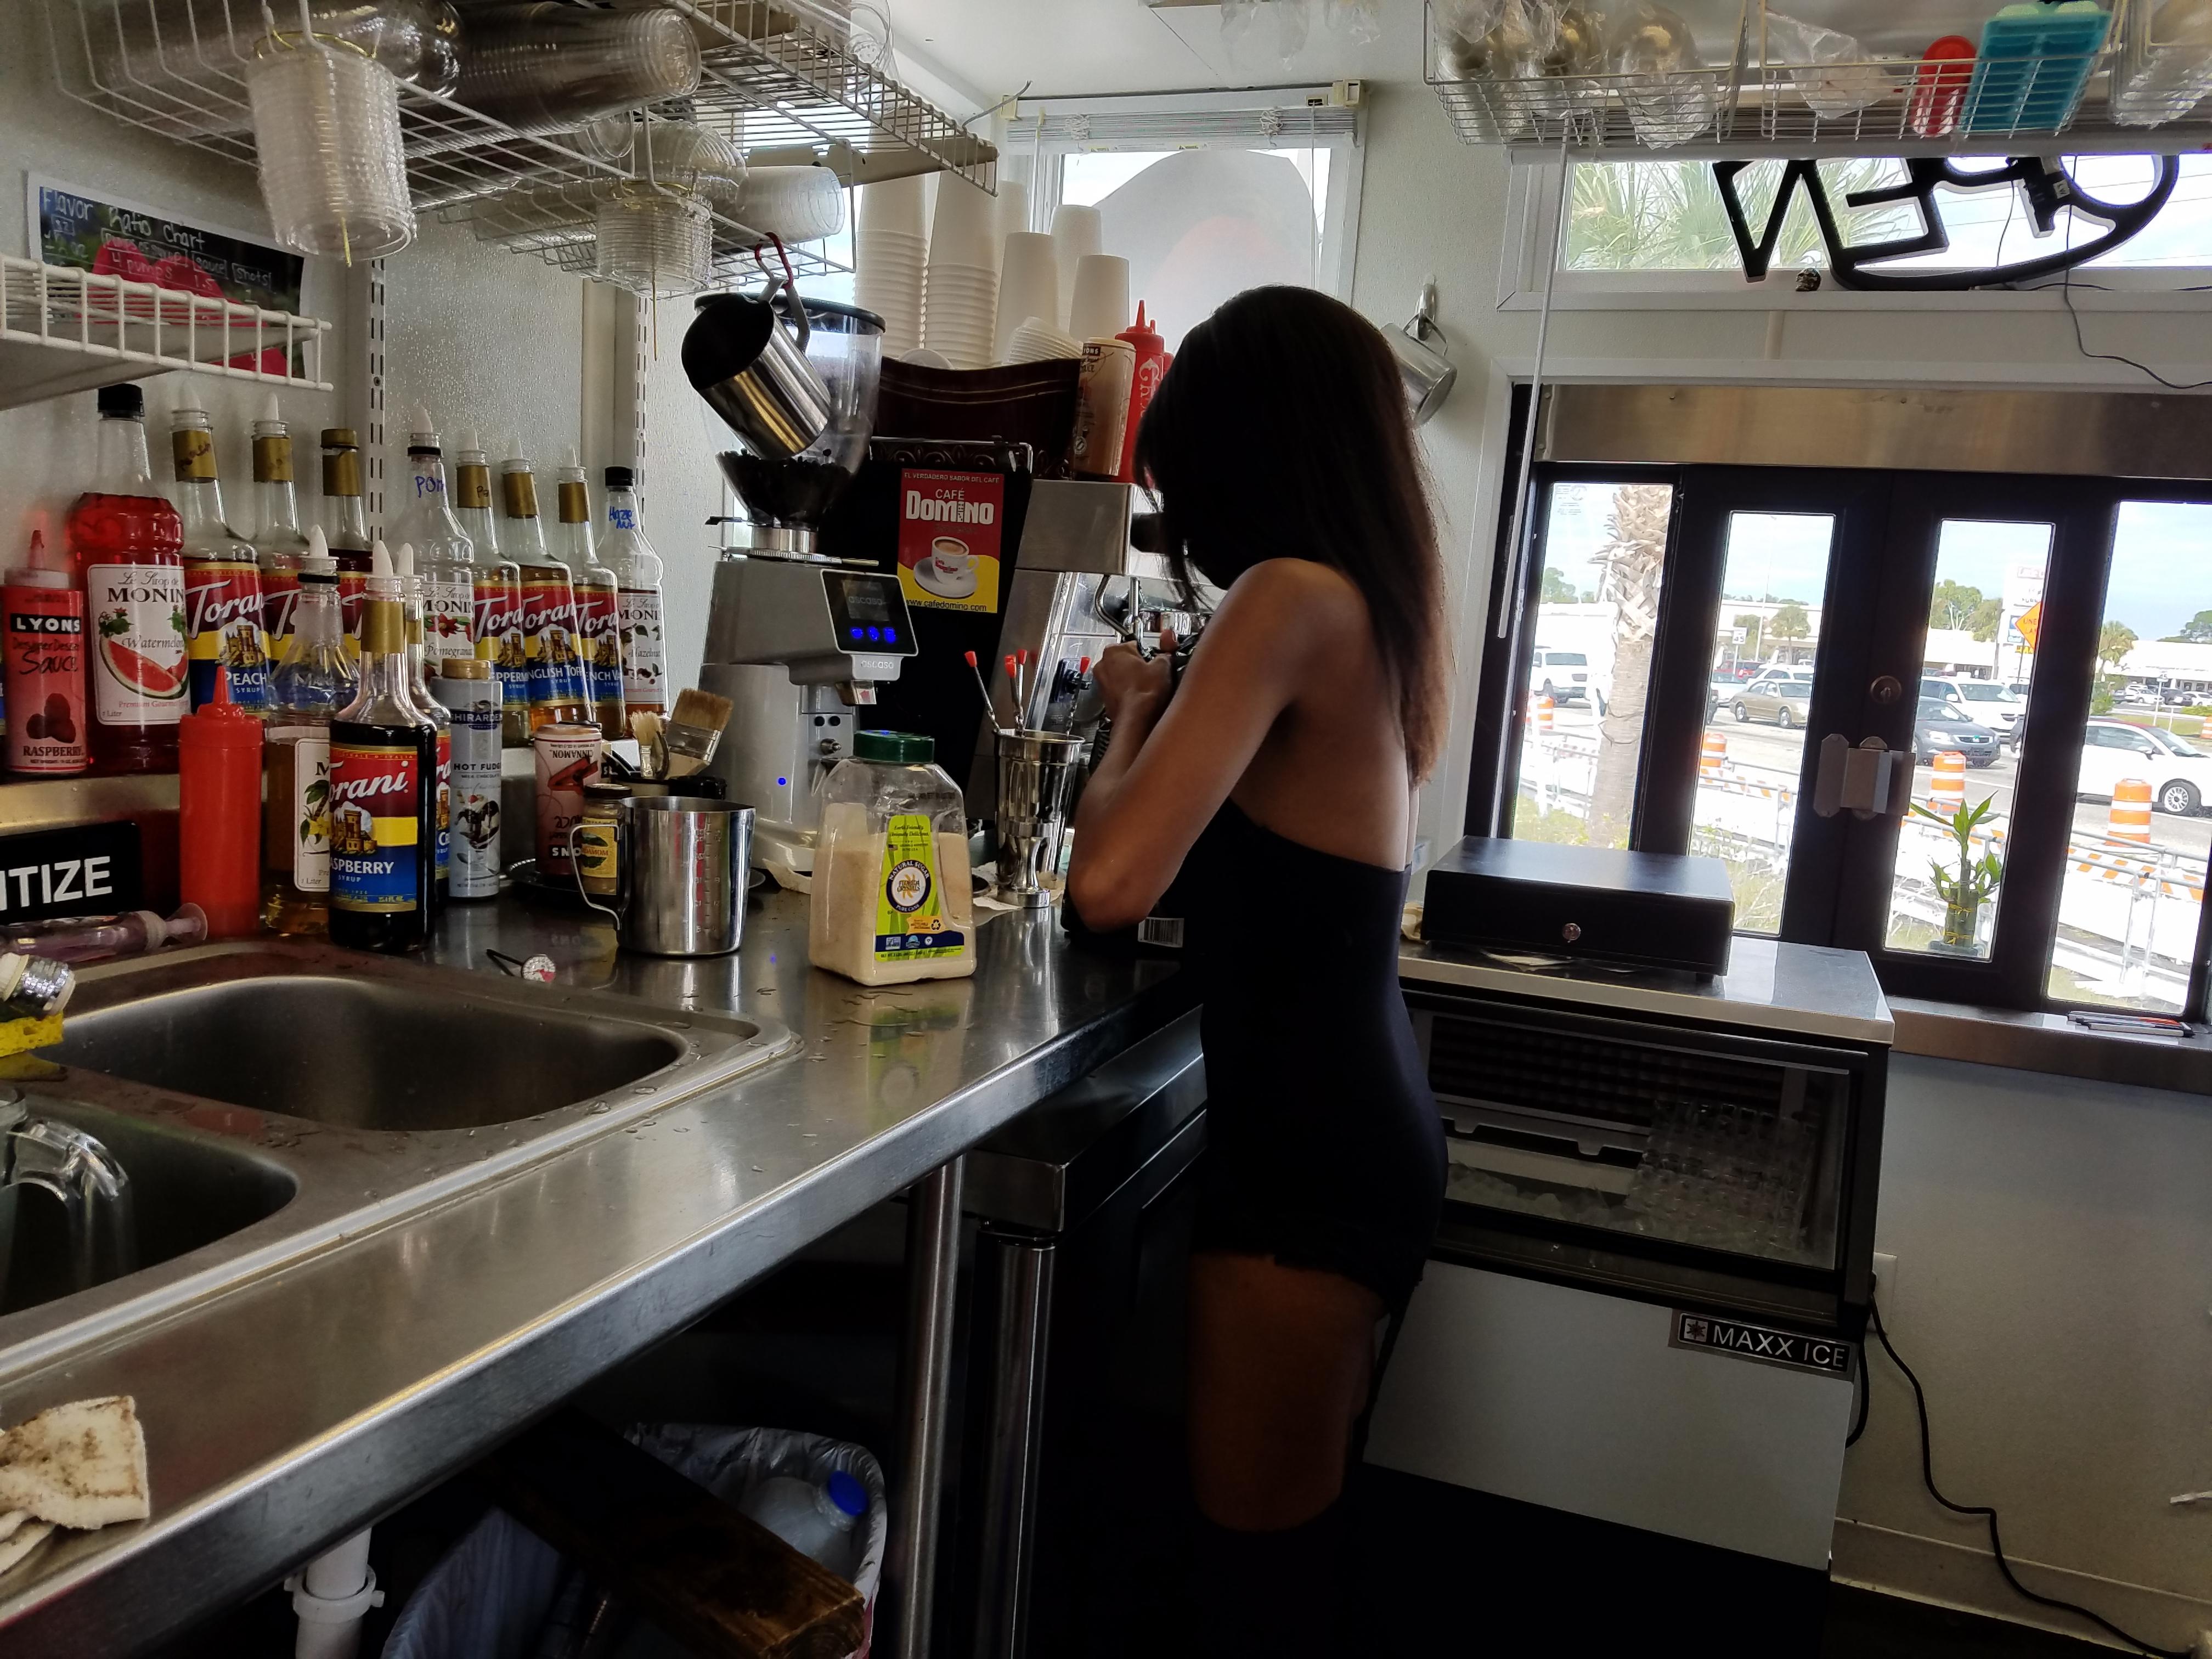 Port Charlotte Fl News >> Coffee Hot Uniforms Racy At Charlotte Harbor Business